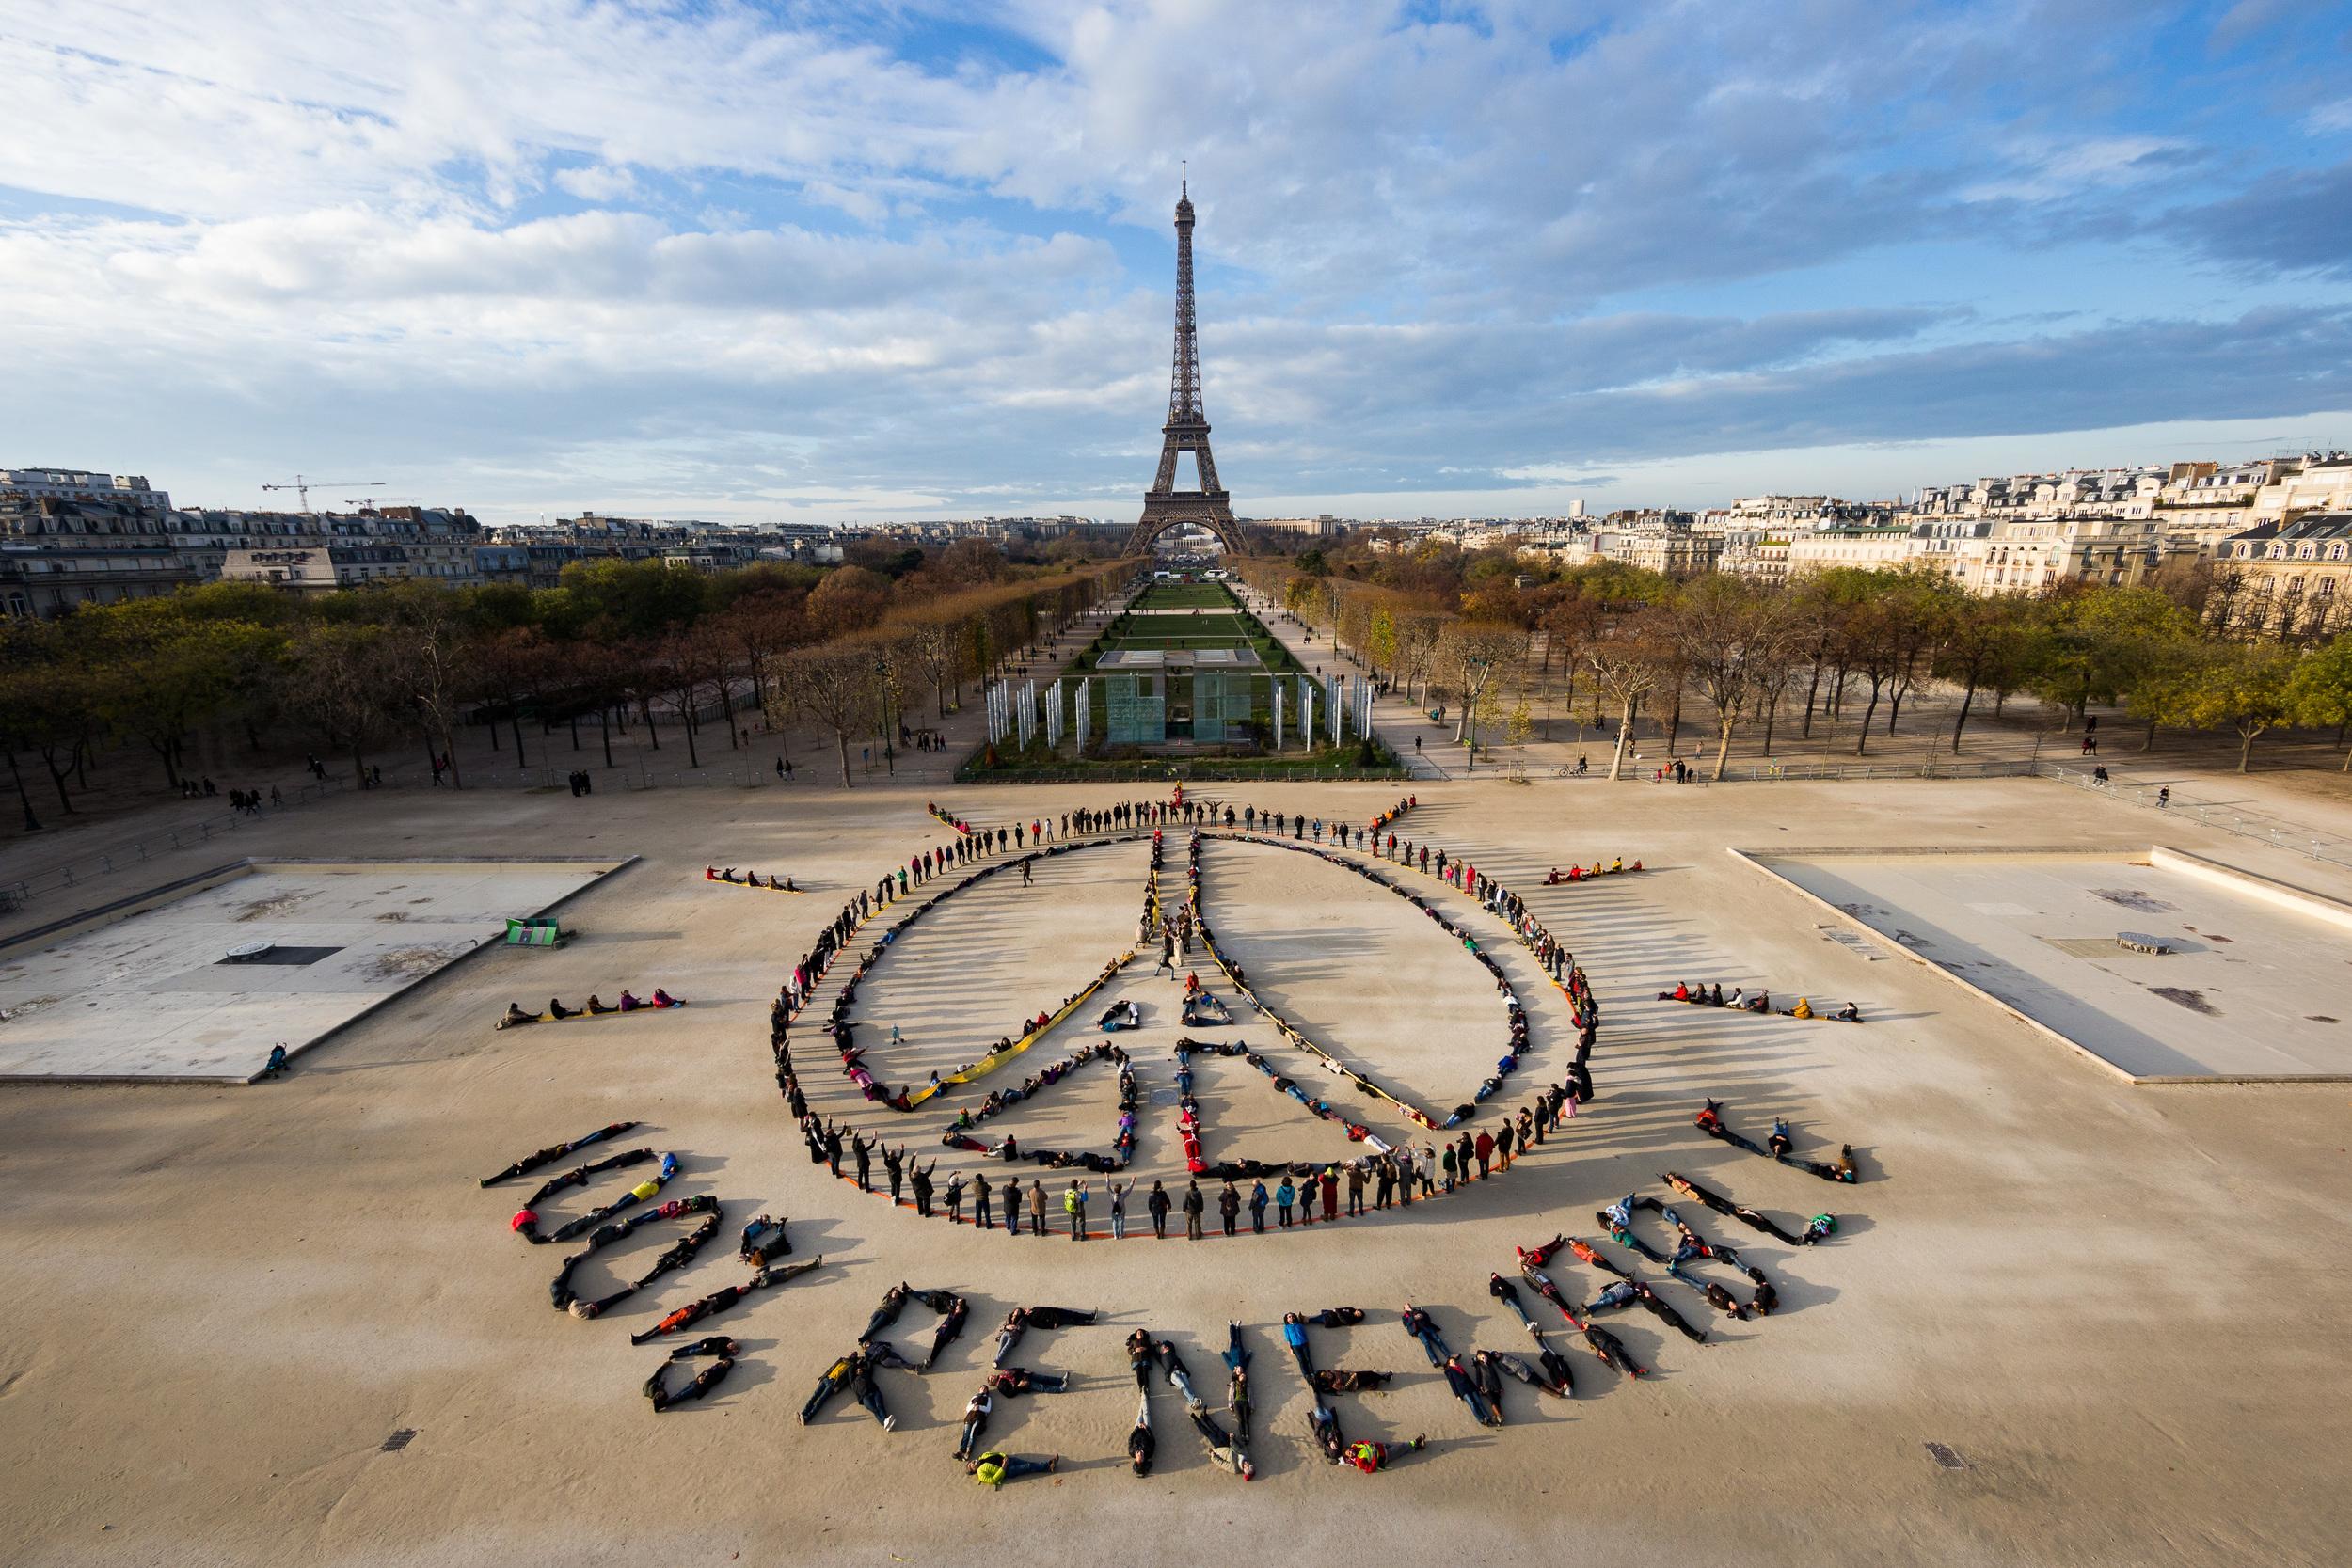 greenpeace international